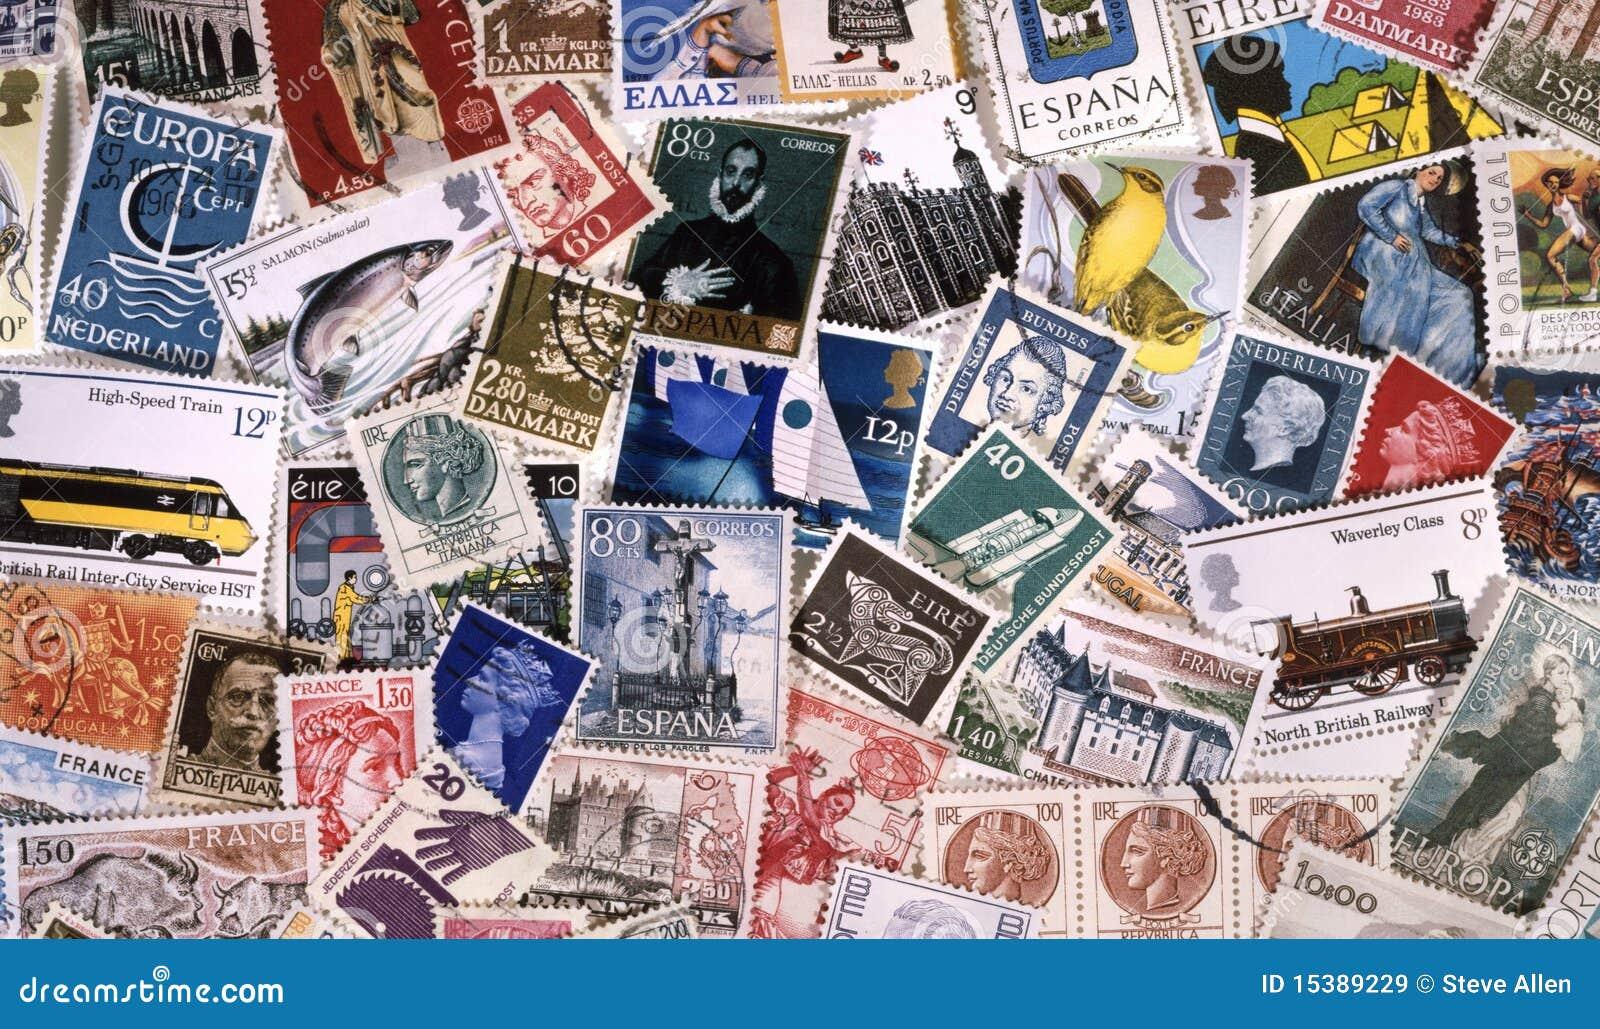 stamp collectors sydney australia time - photo#29